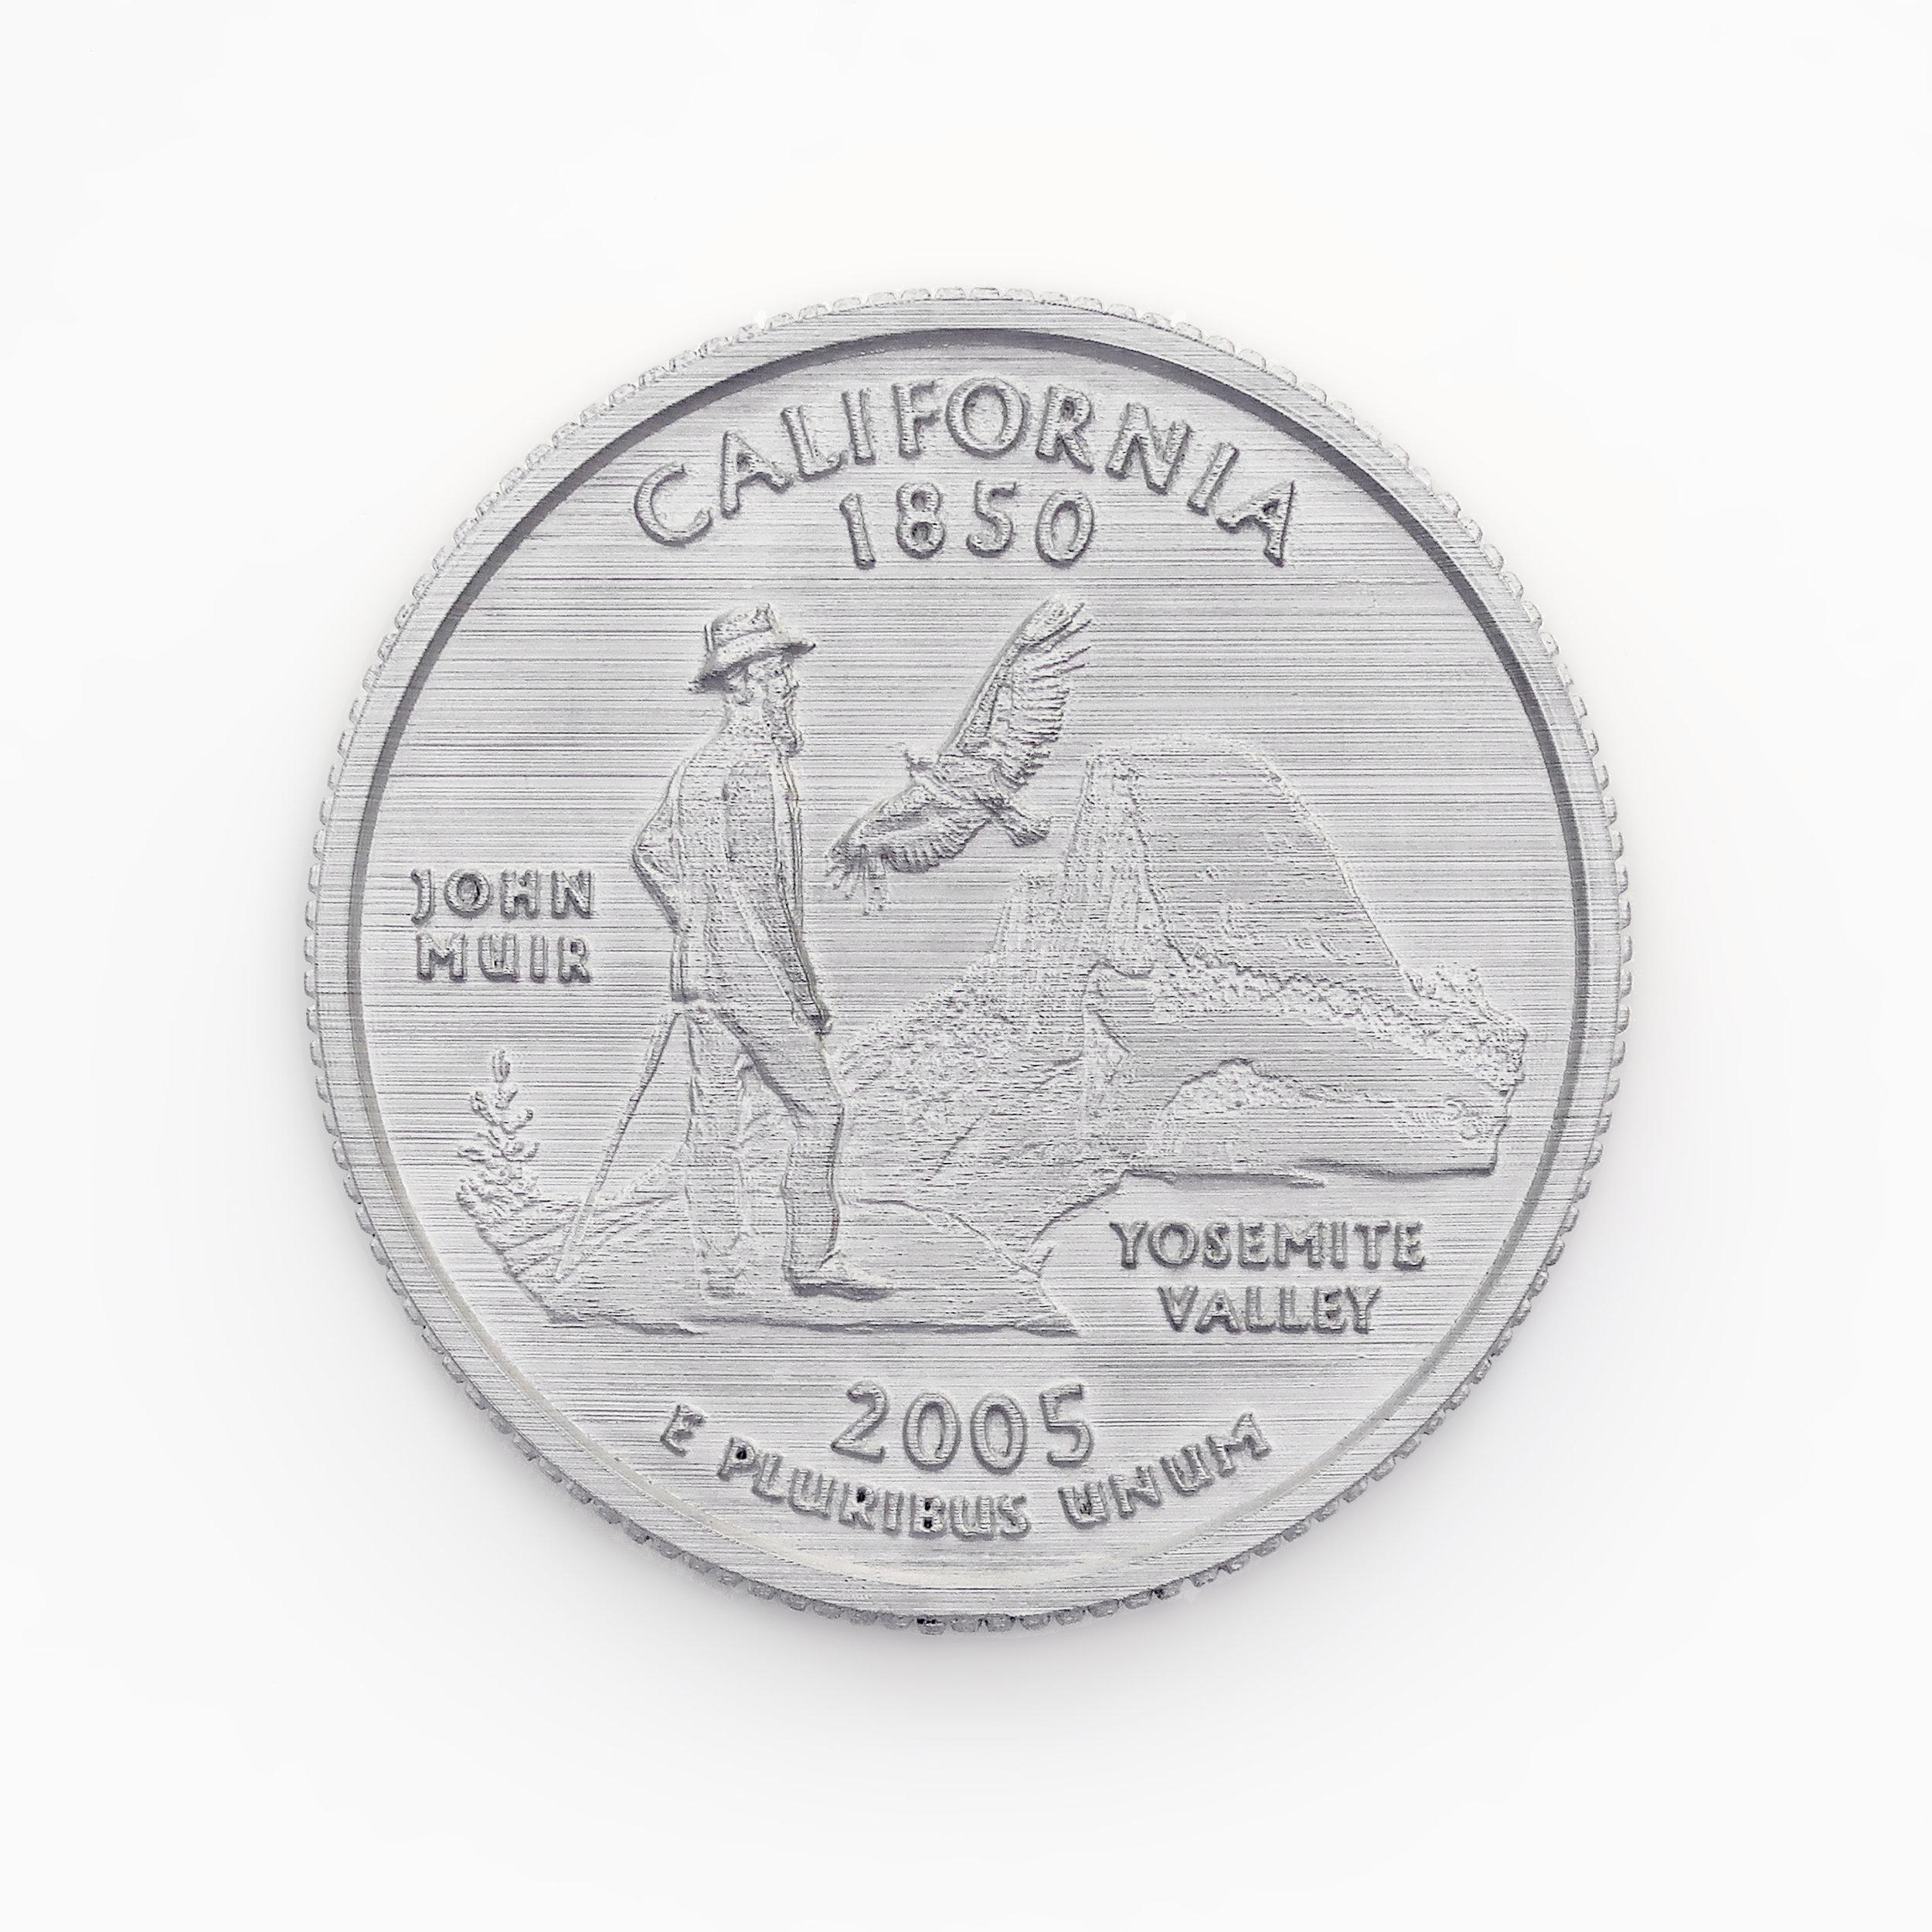 CALIFORNIA_3000x3000.jpg